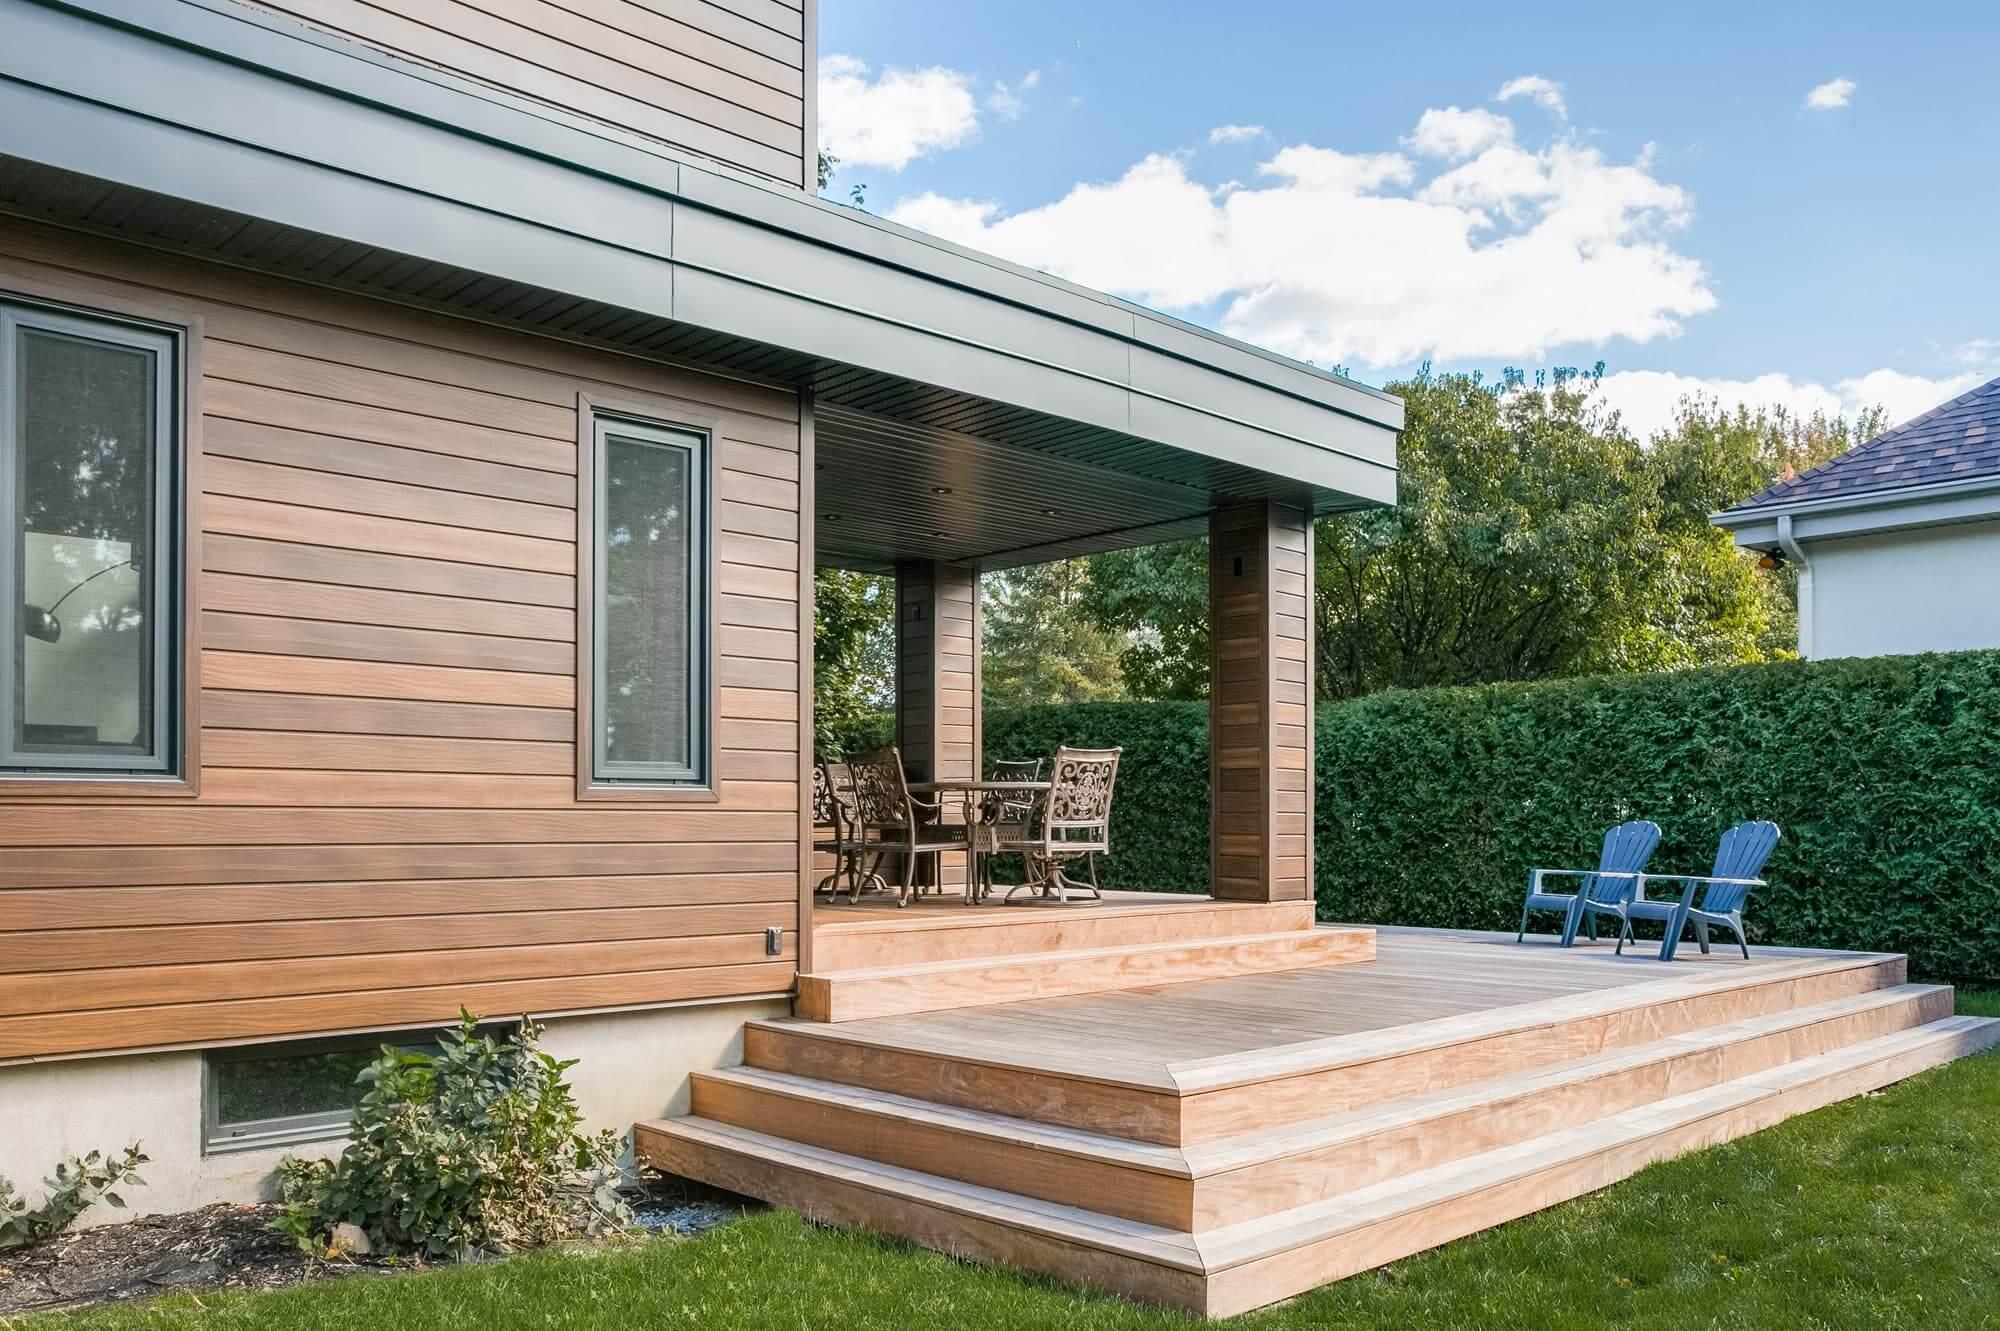 terrasse en bois moderne avec toit